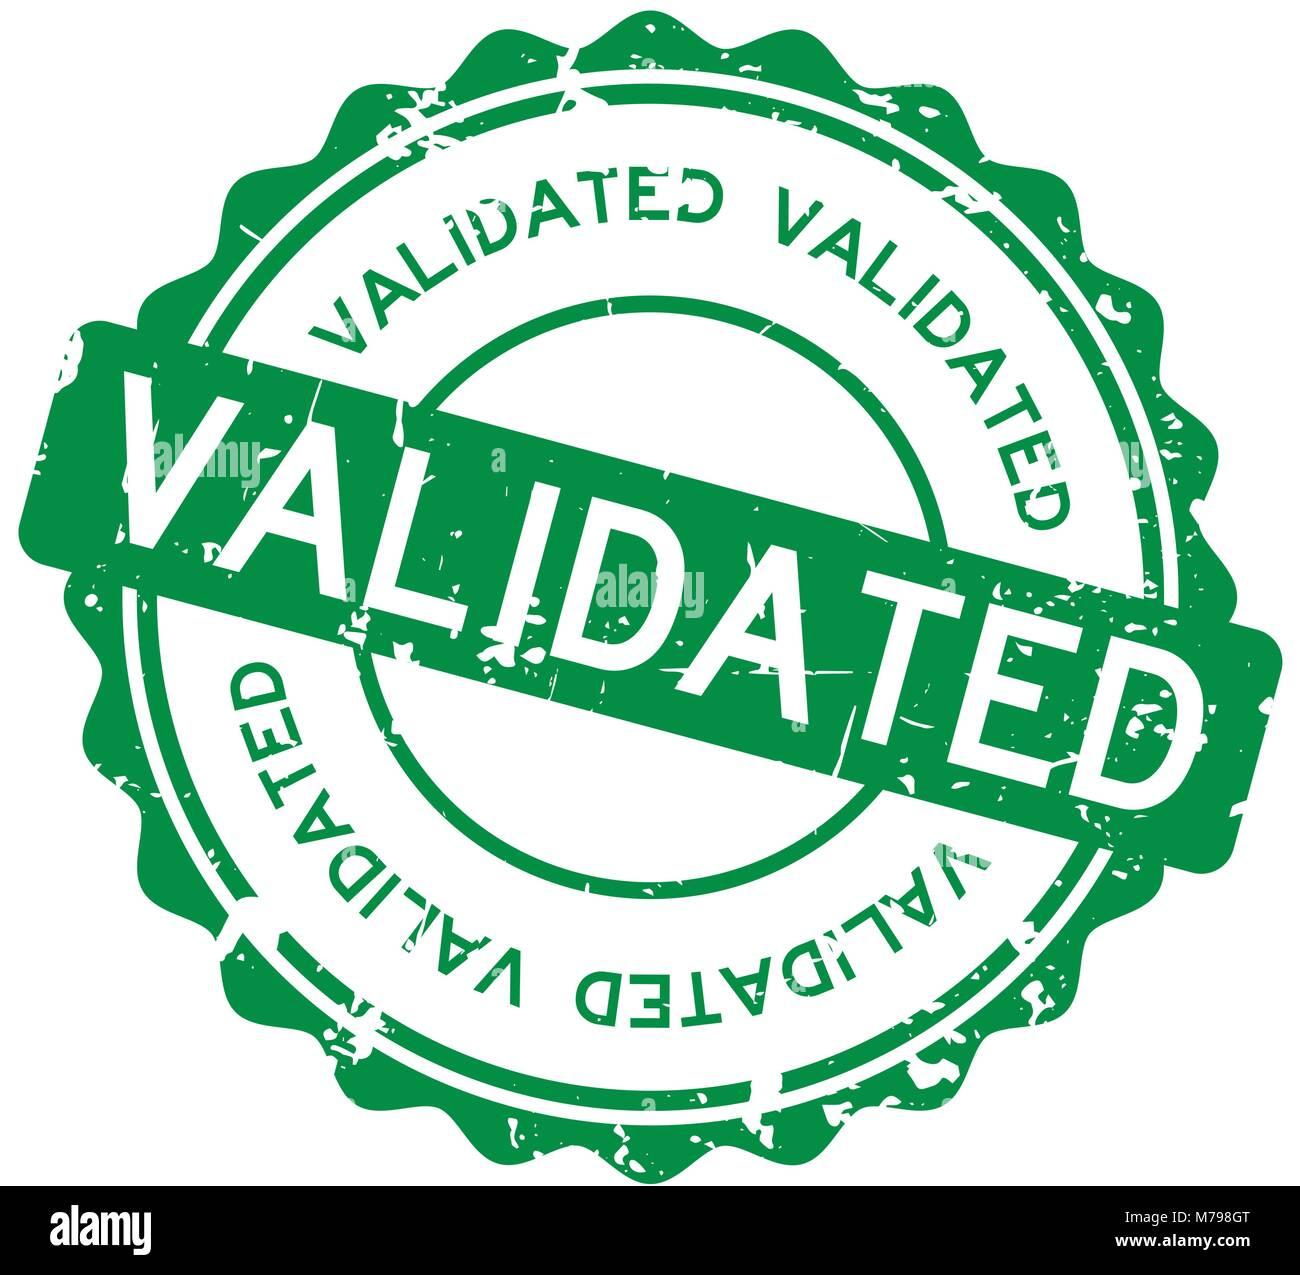 Grunge Green Validated Wording Round Rubber Seal Stamp On White Background